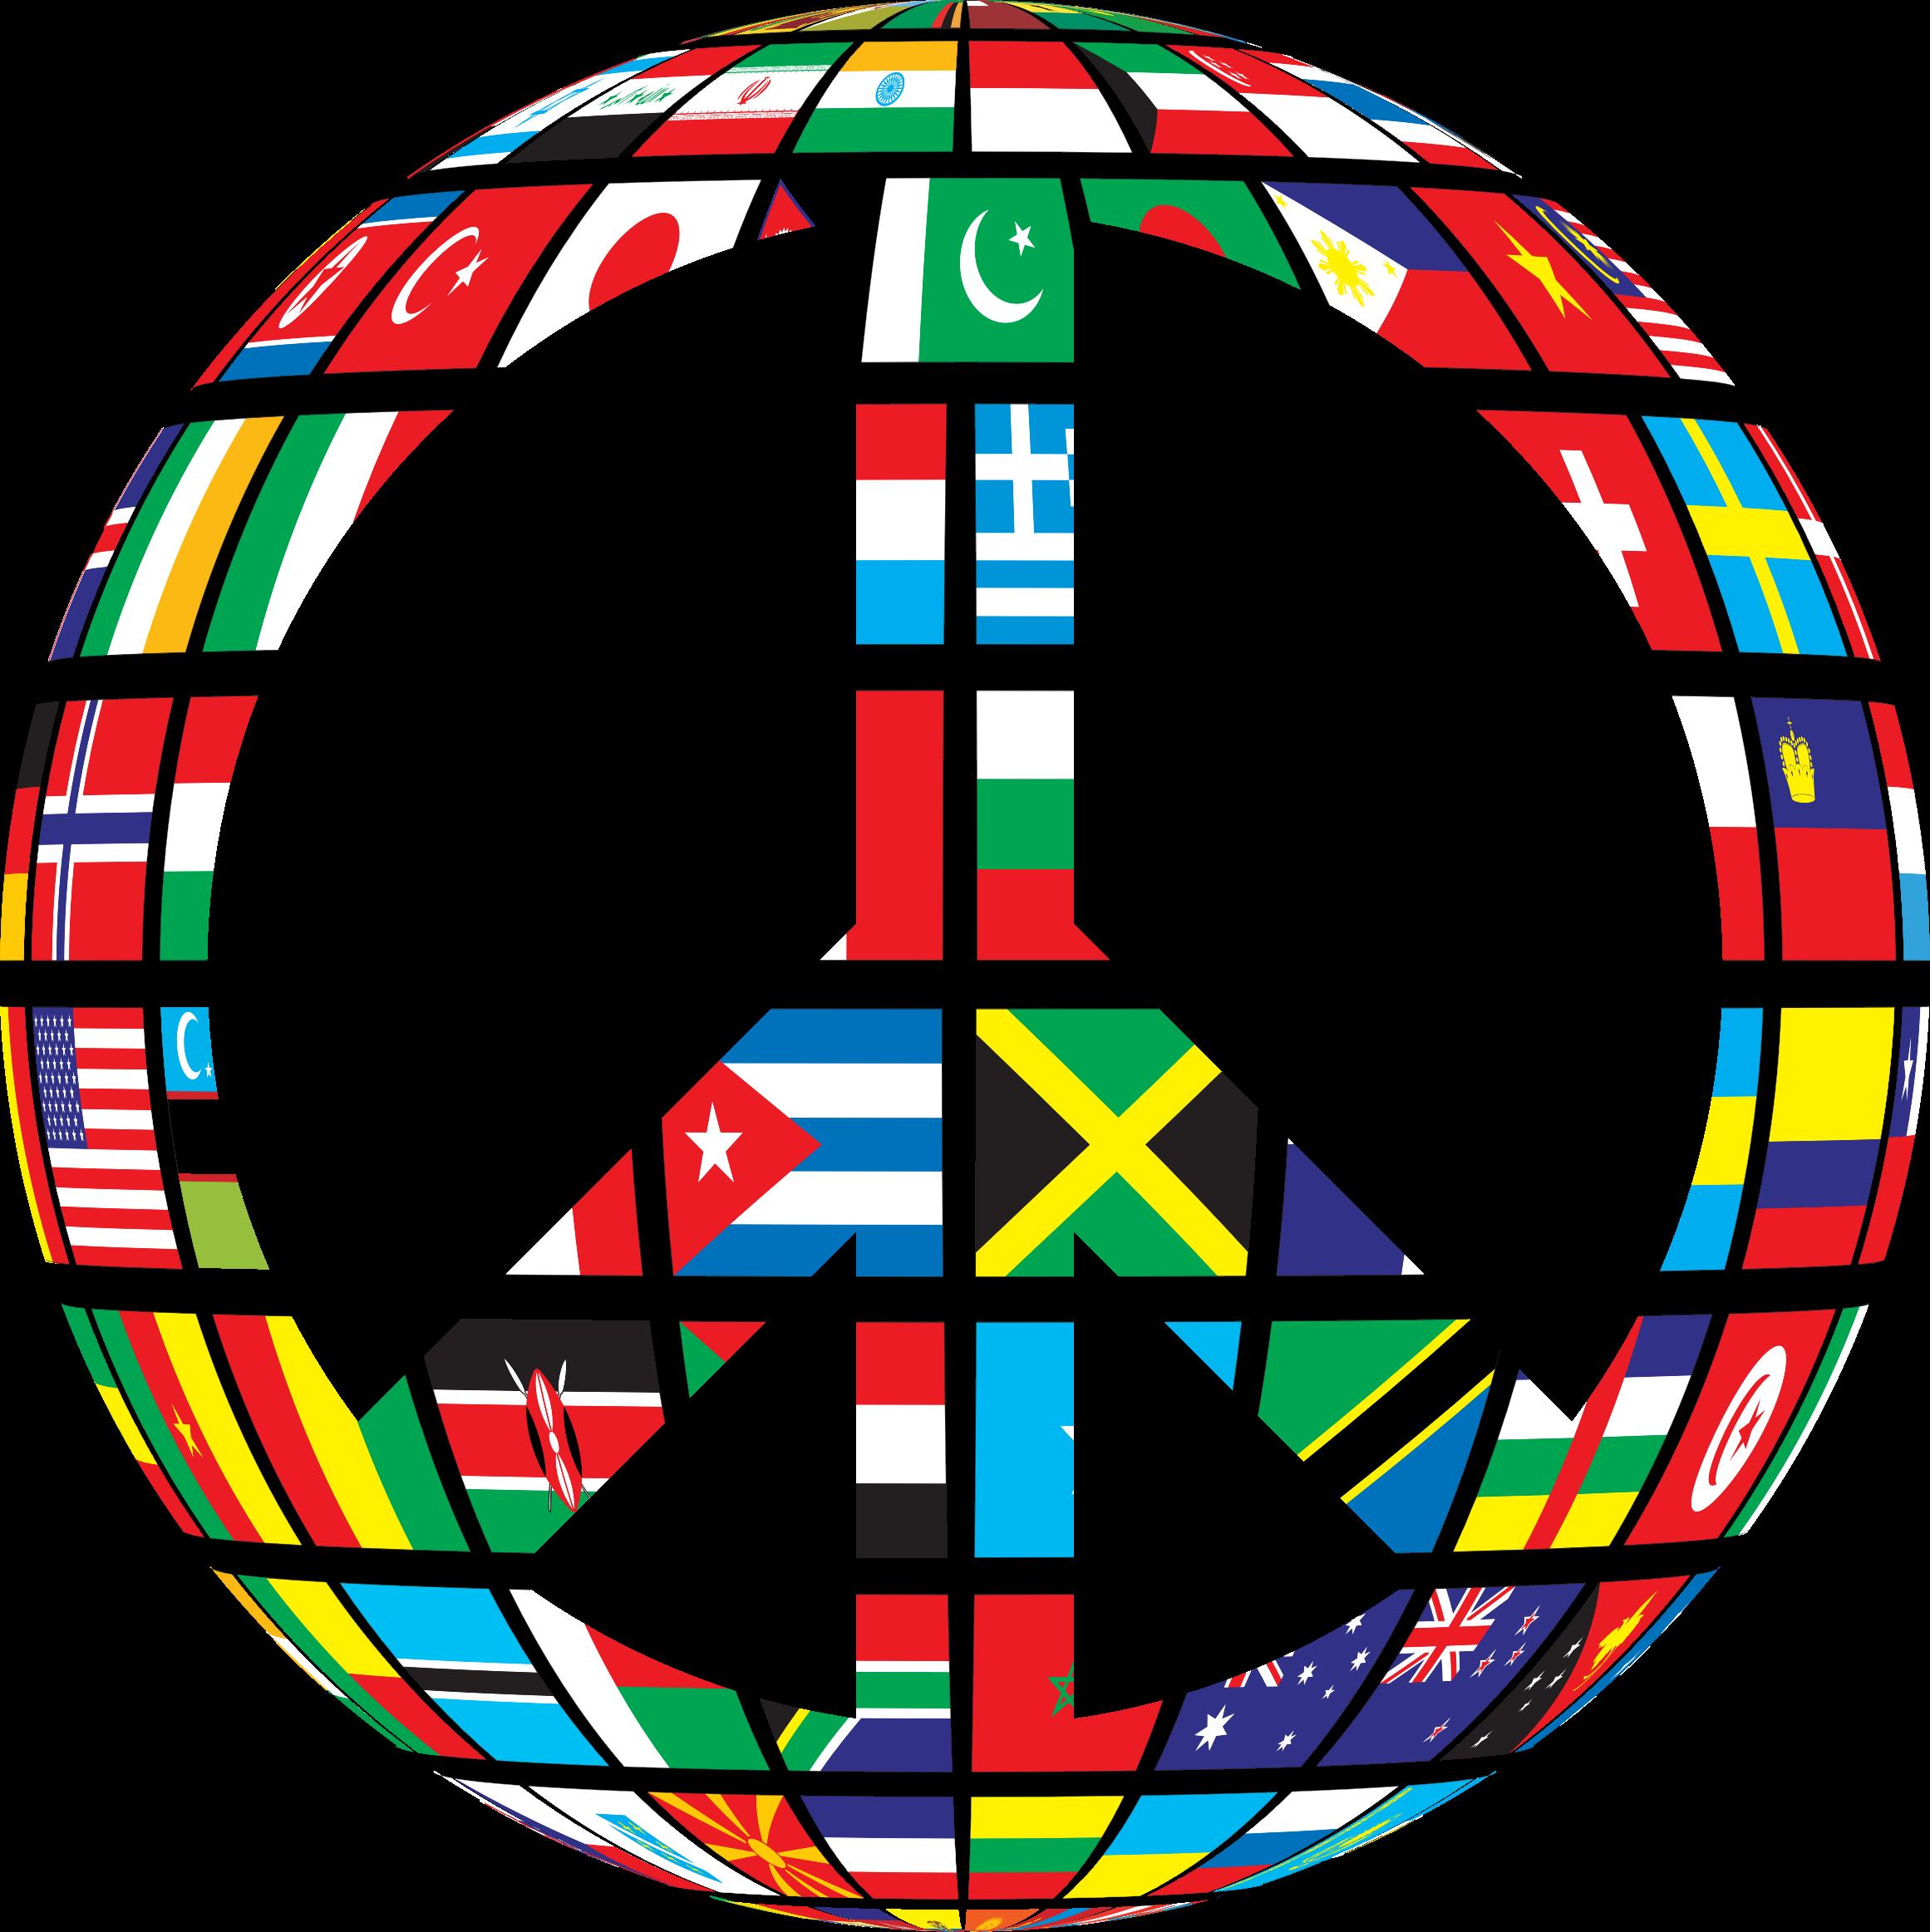 Peace clipart global issue Clipart Peace Peace Global Global